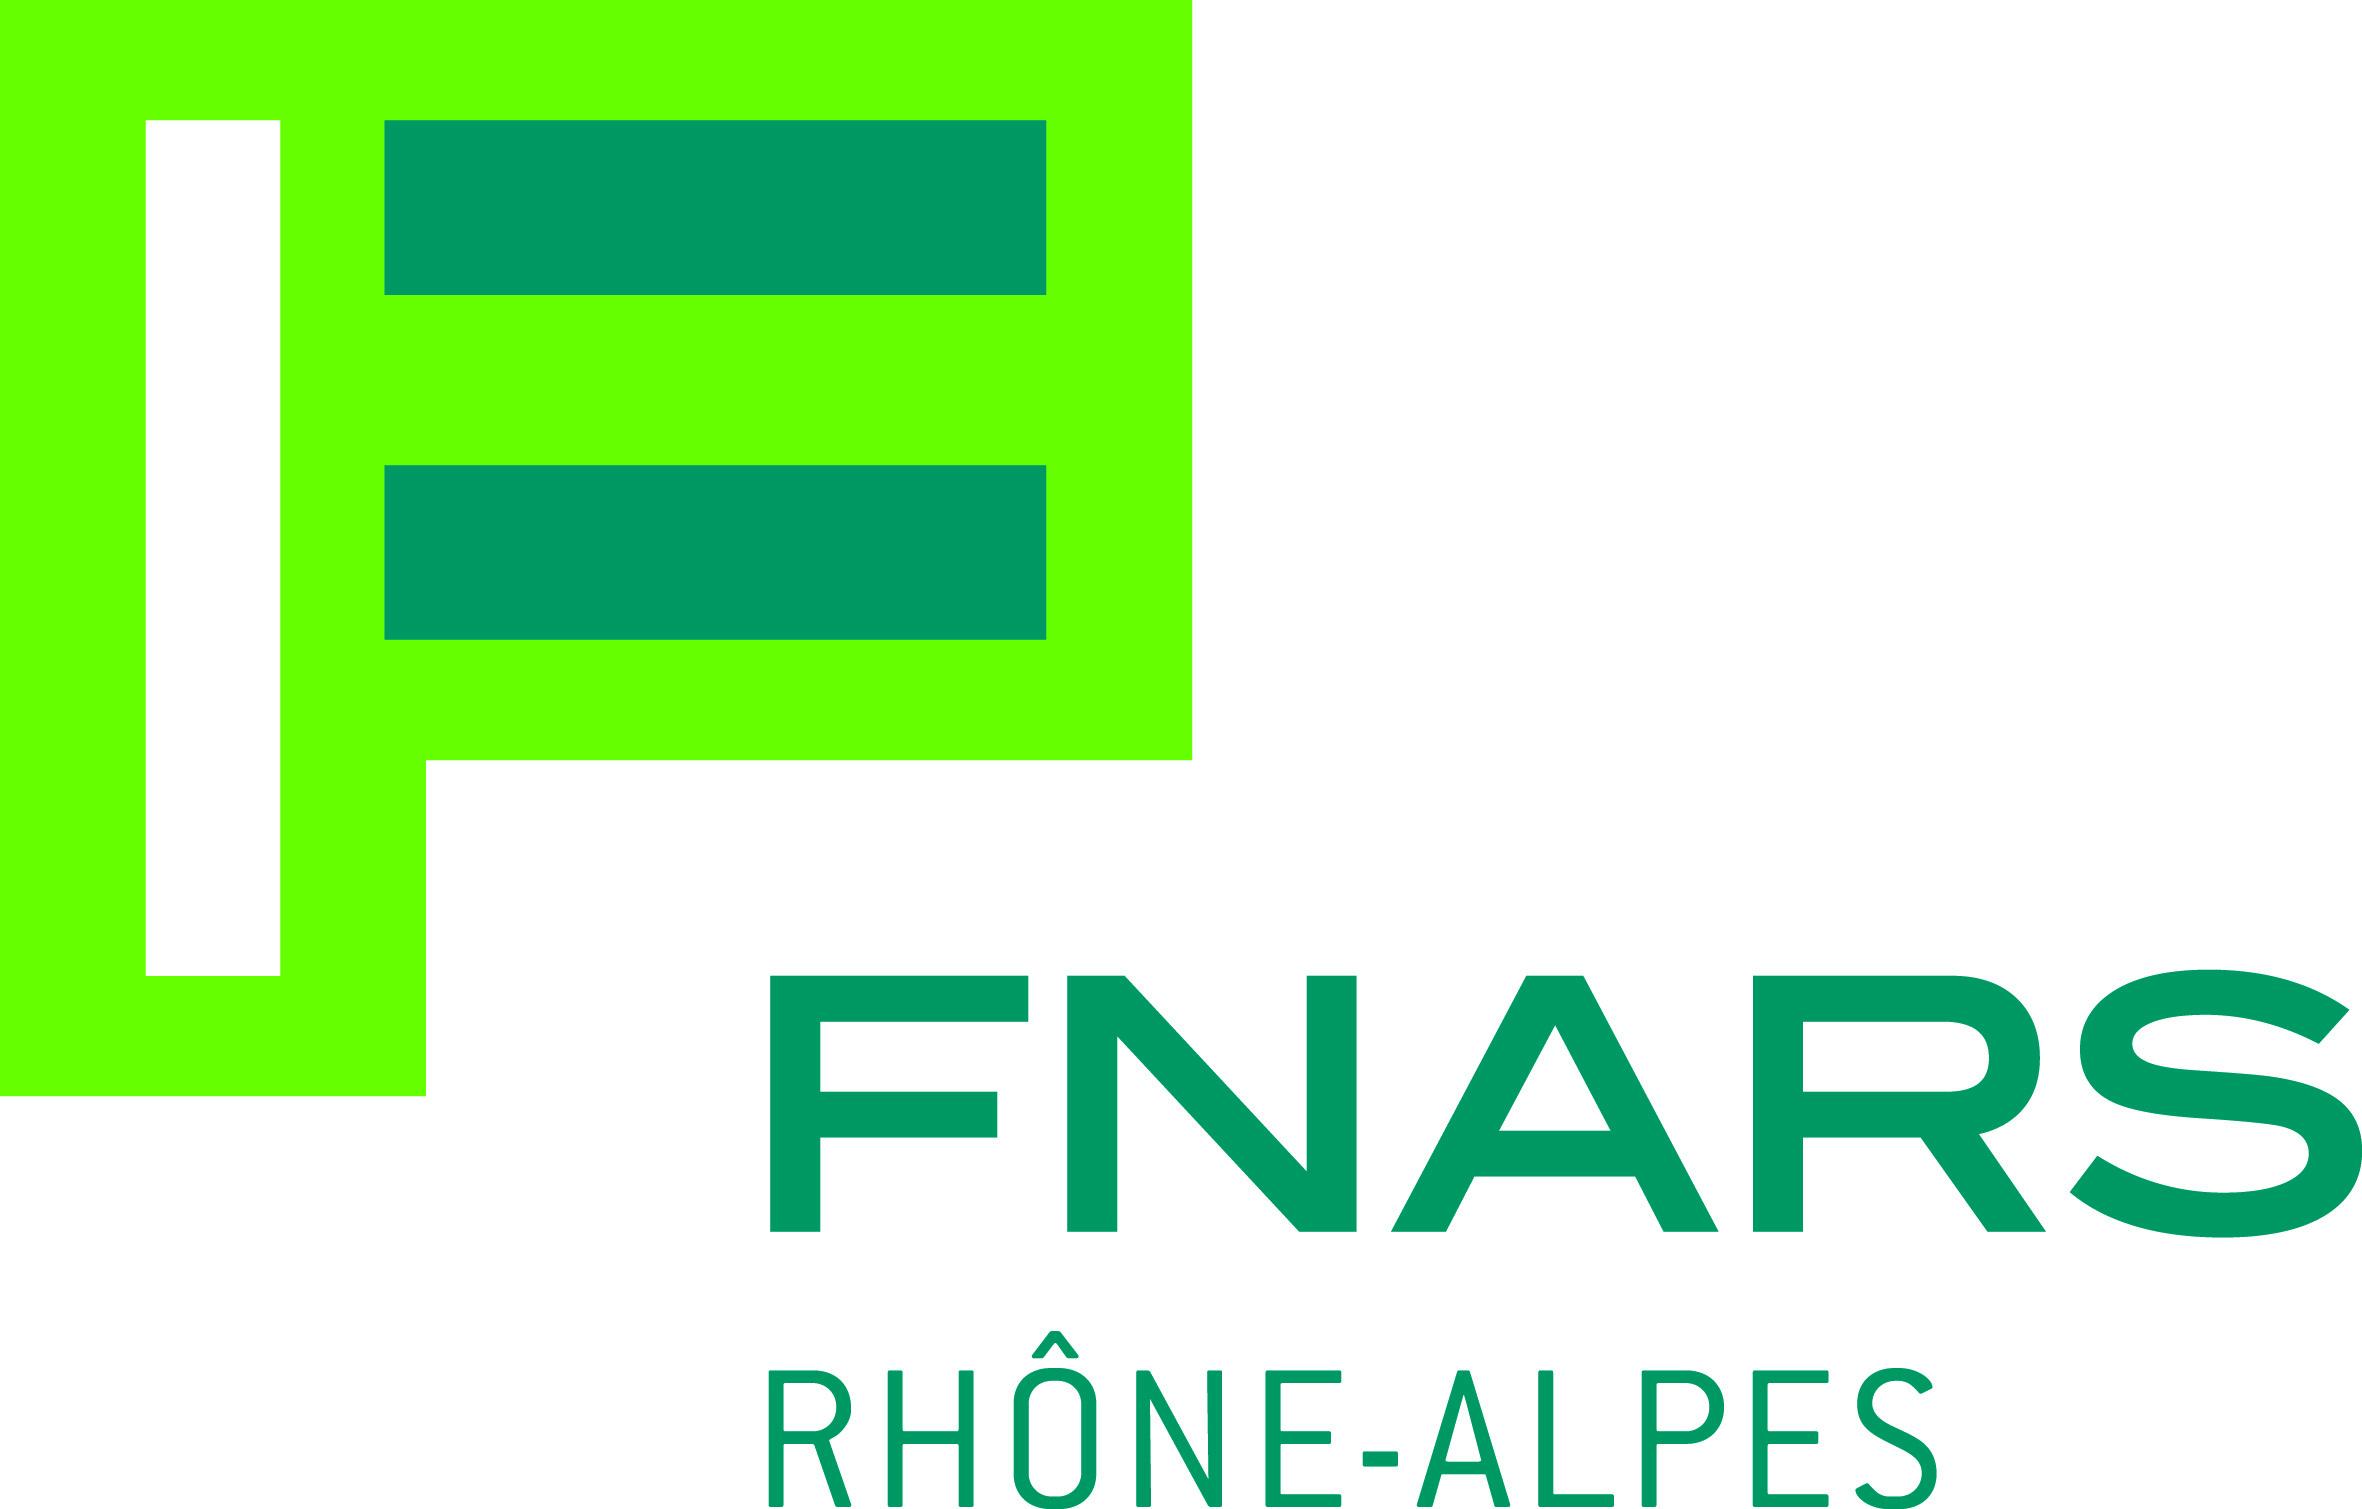 logo_fnars_rhone_alpes_CMJN.jpg